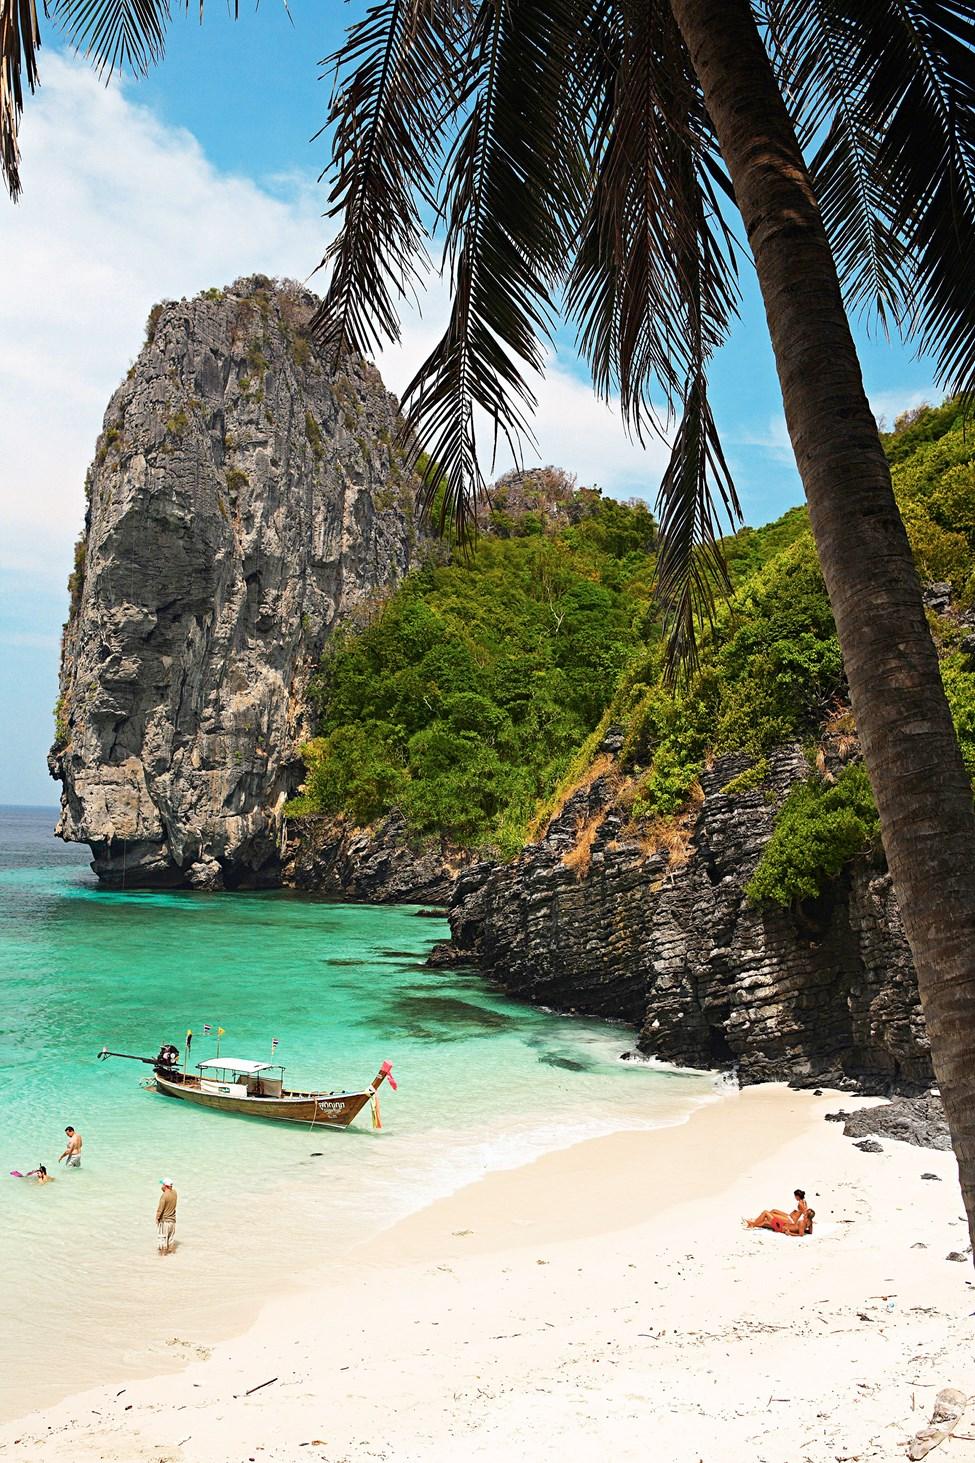 Nuy Bay, Koh Phi Phi